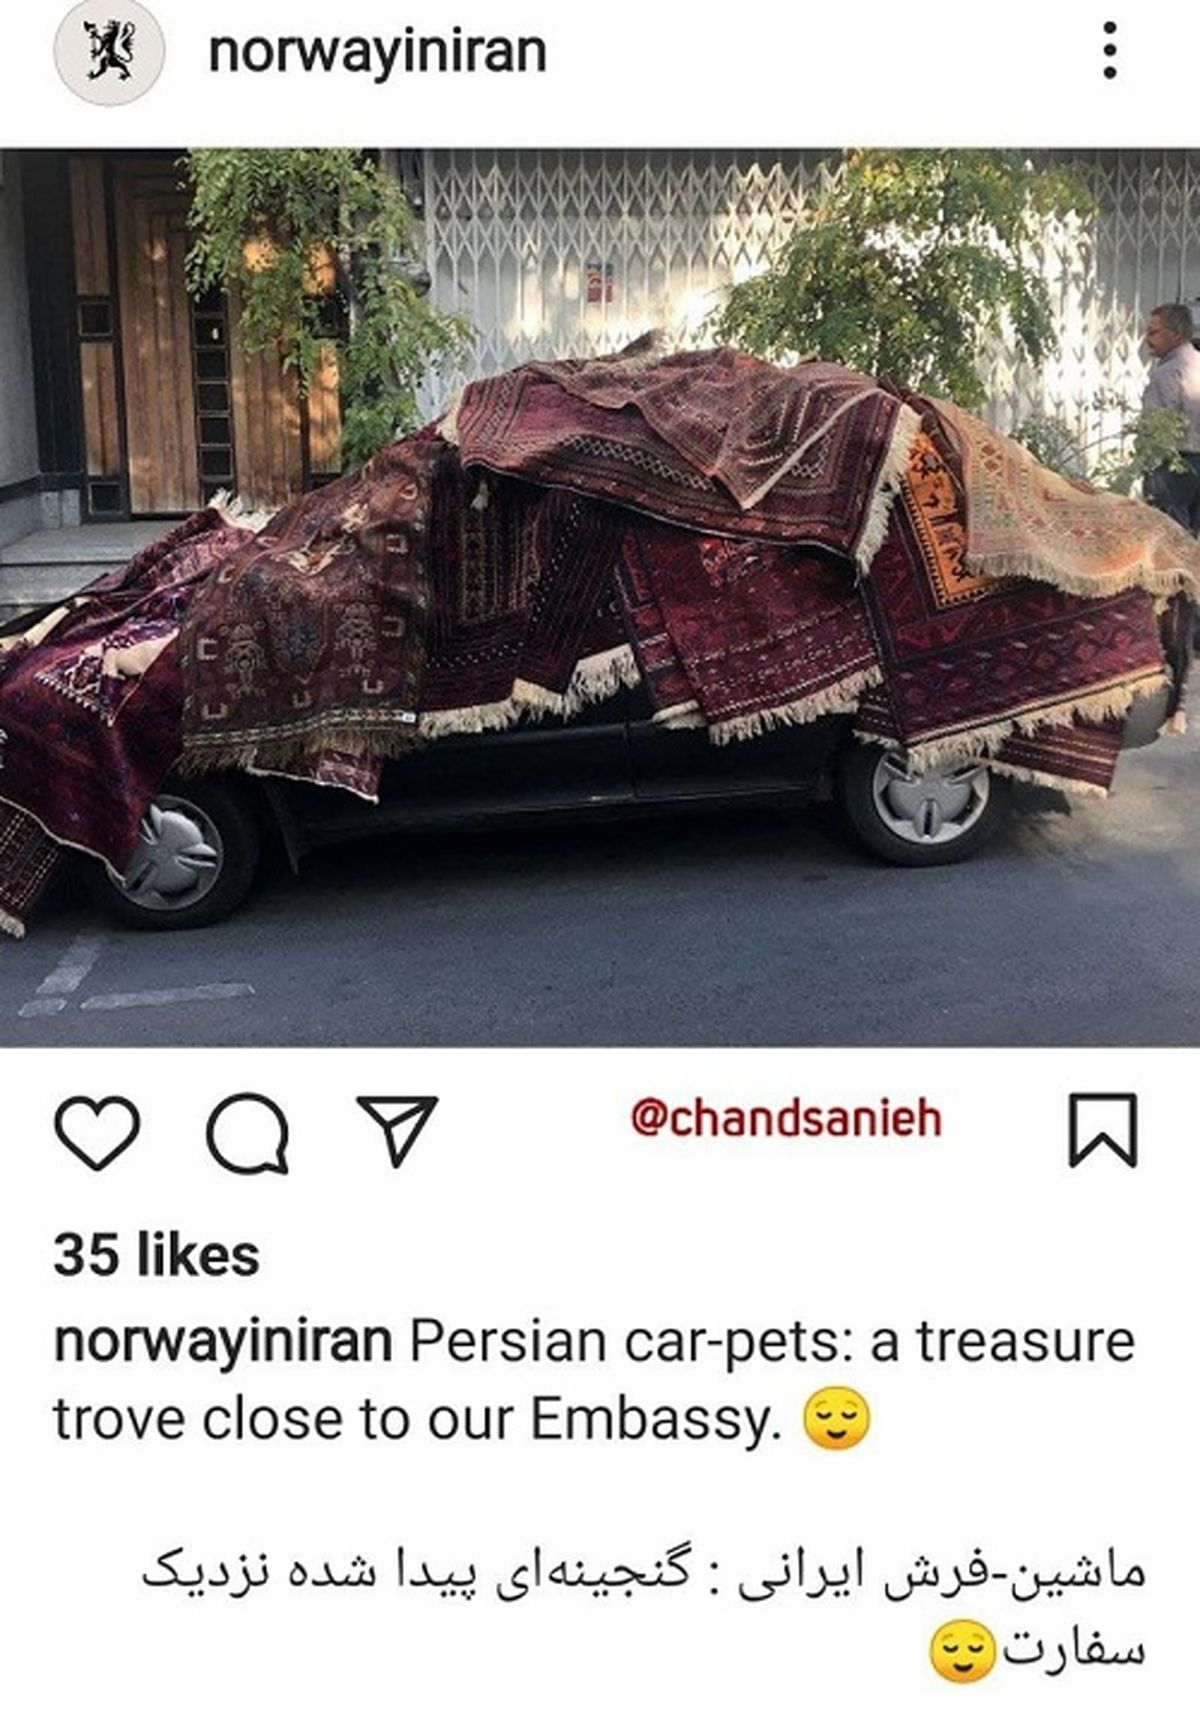 کشف گنج نزدیک سفارت سوئد!+عکس